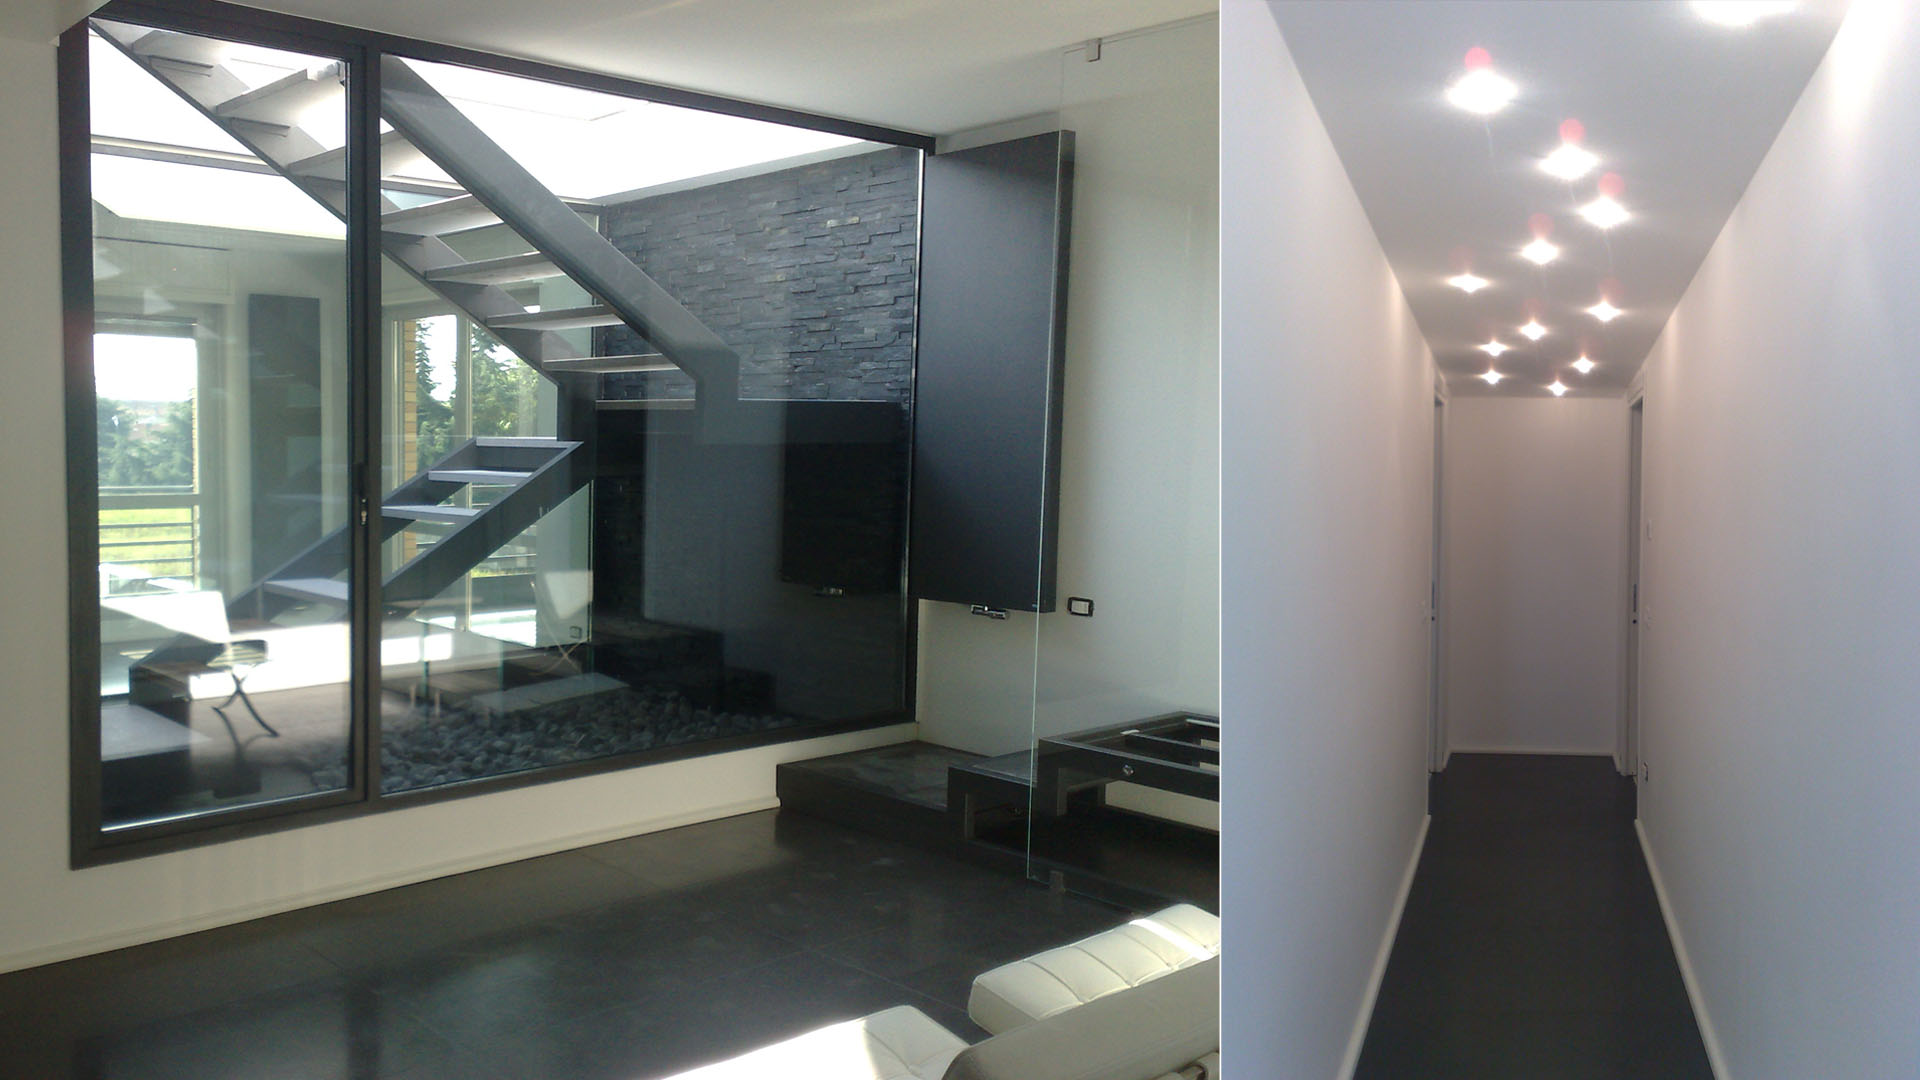 raum engineering research architecture urban masterplan. Black Bedroom Furniture Sets. Home Design Ideas